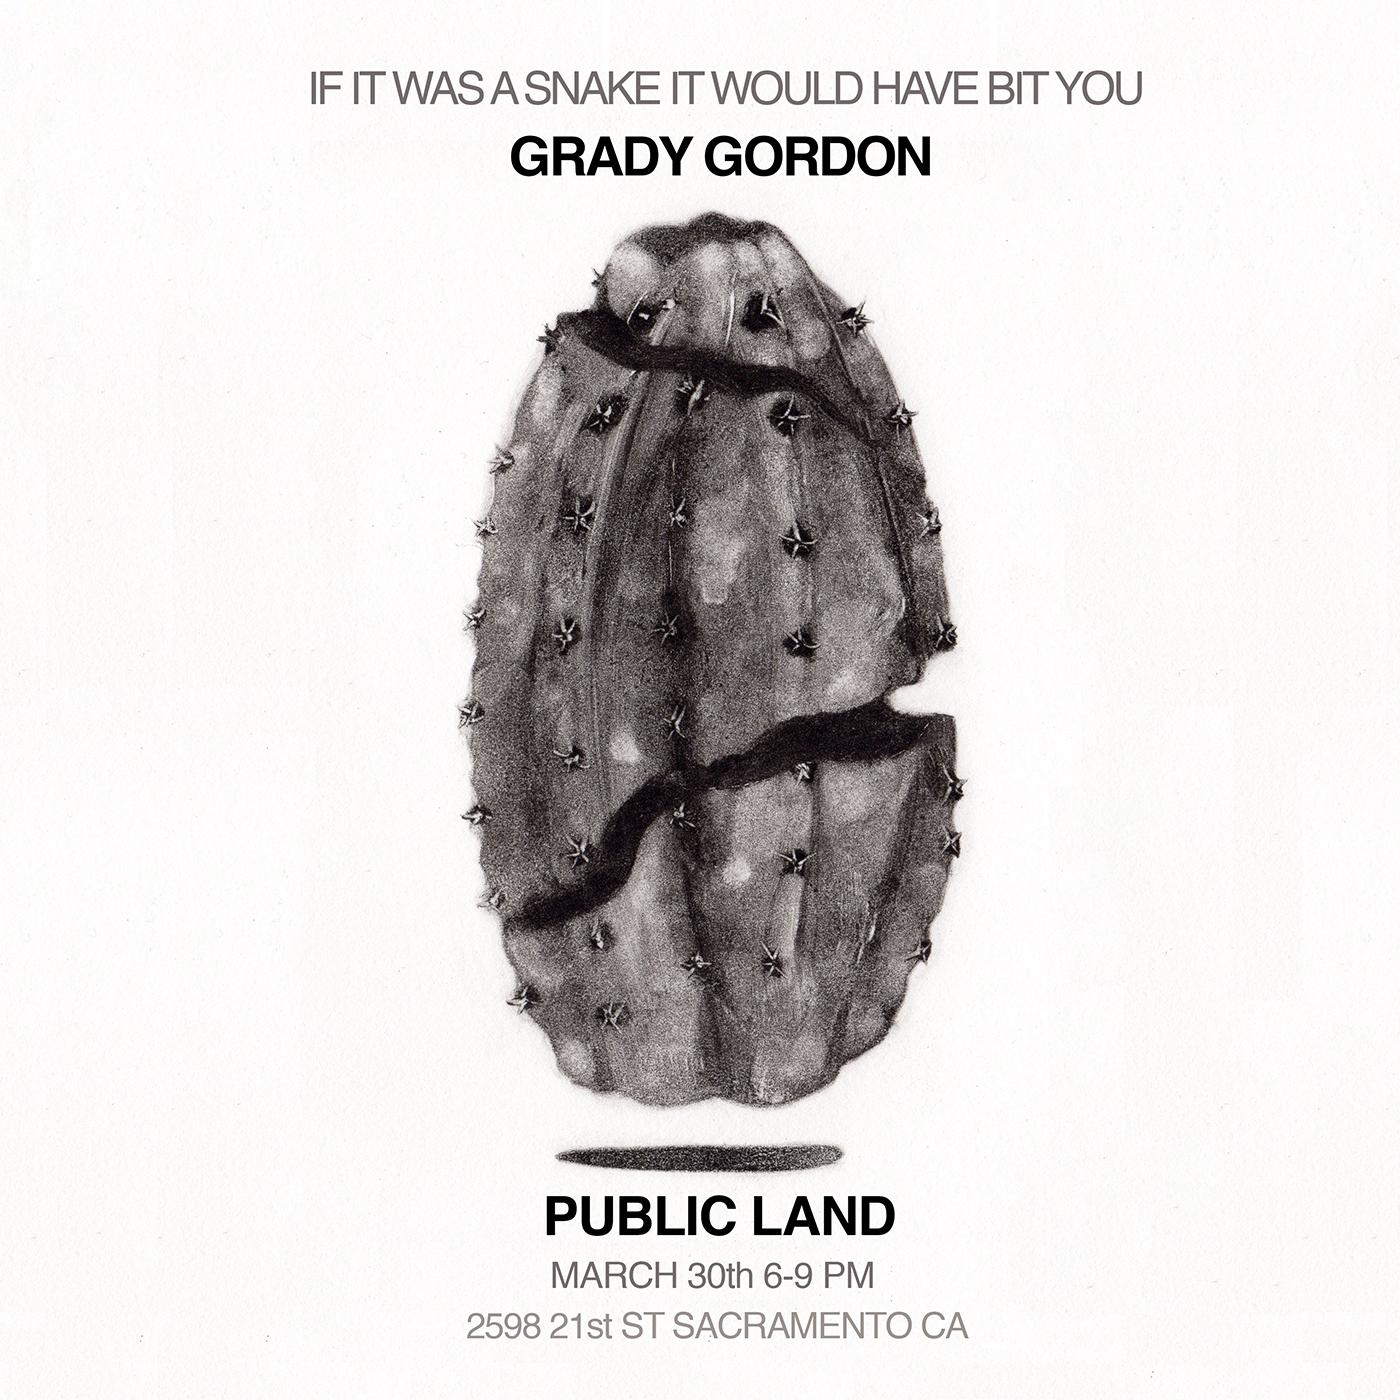 Grady Gordon cactus illustration at Public Land in Sacramento.